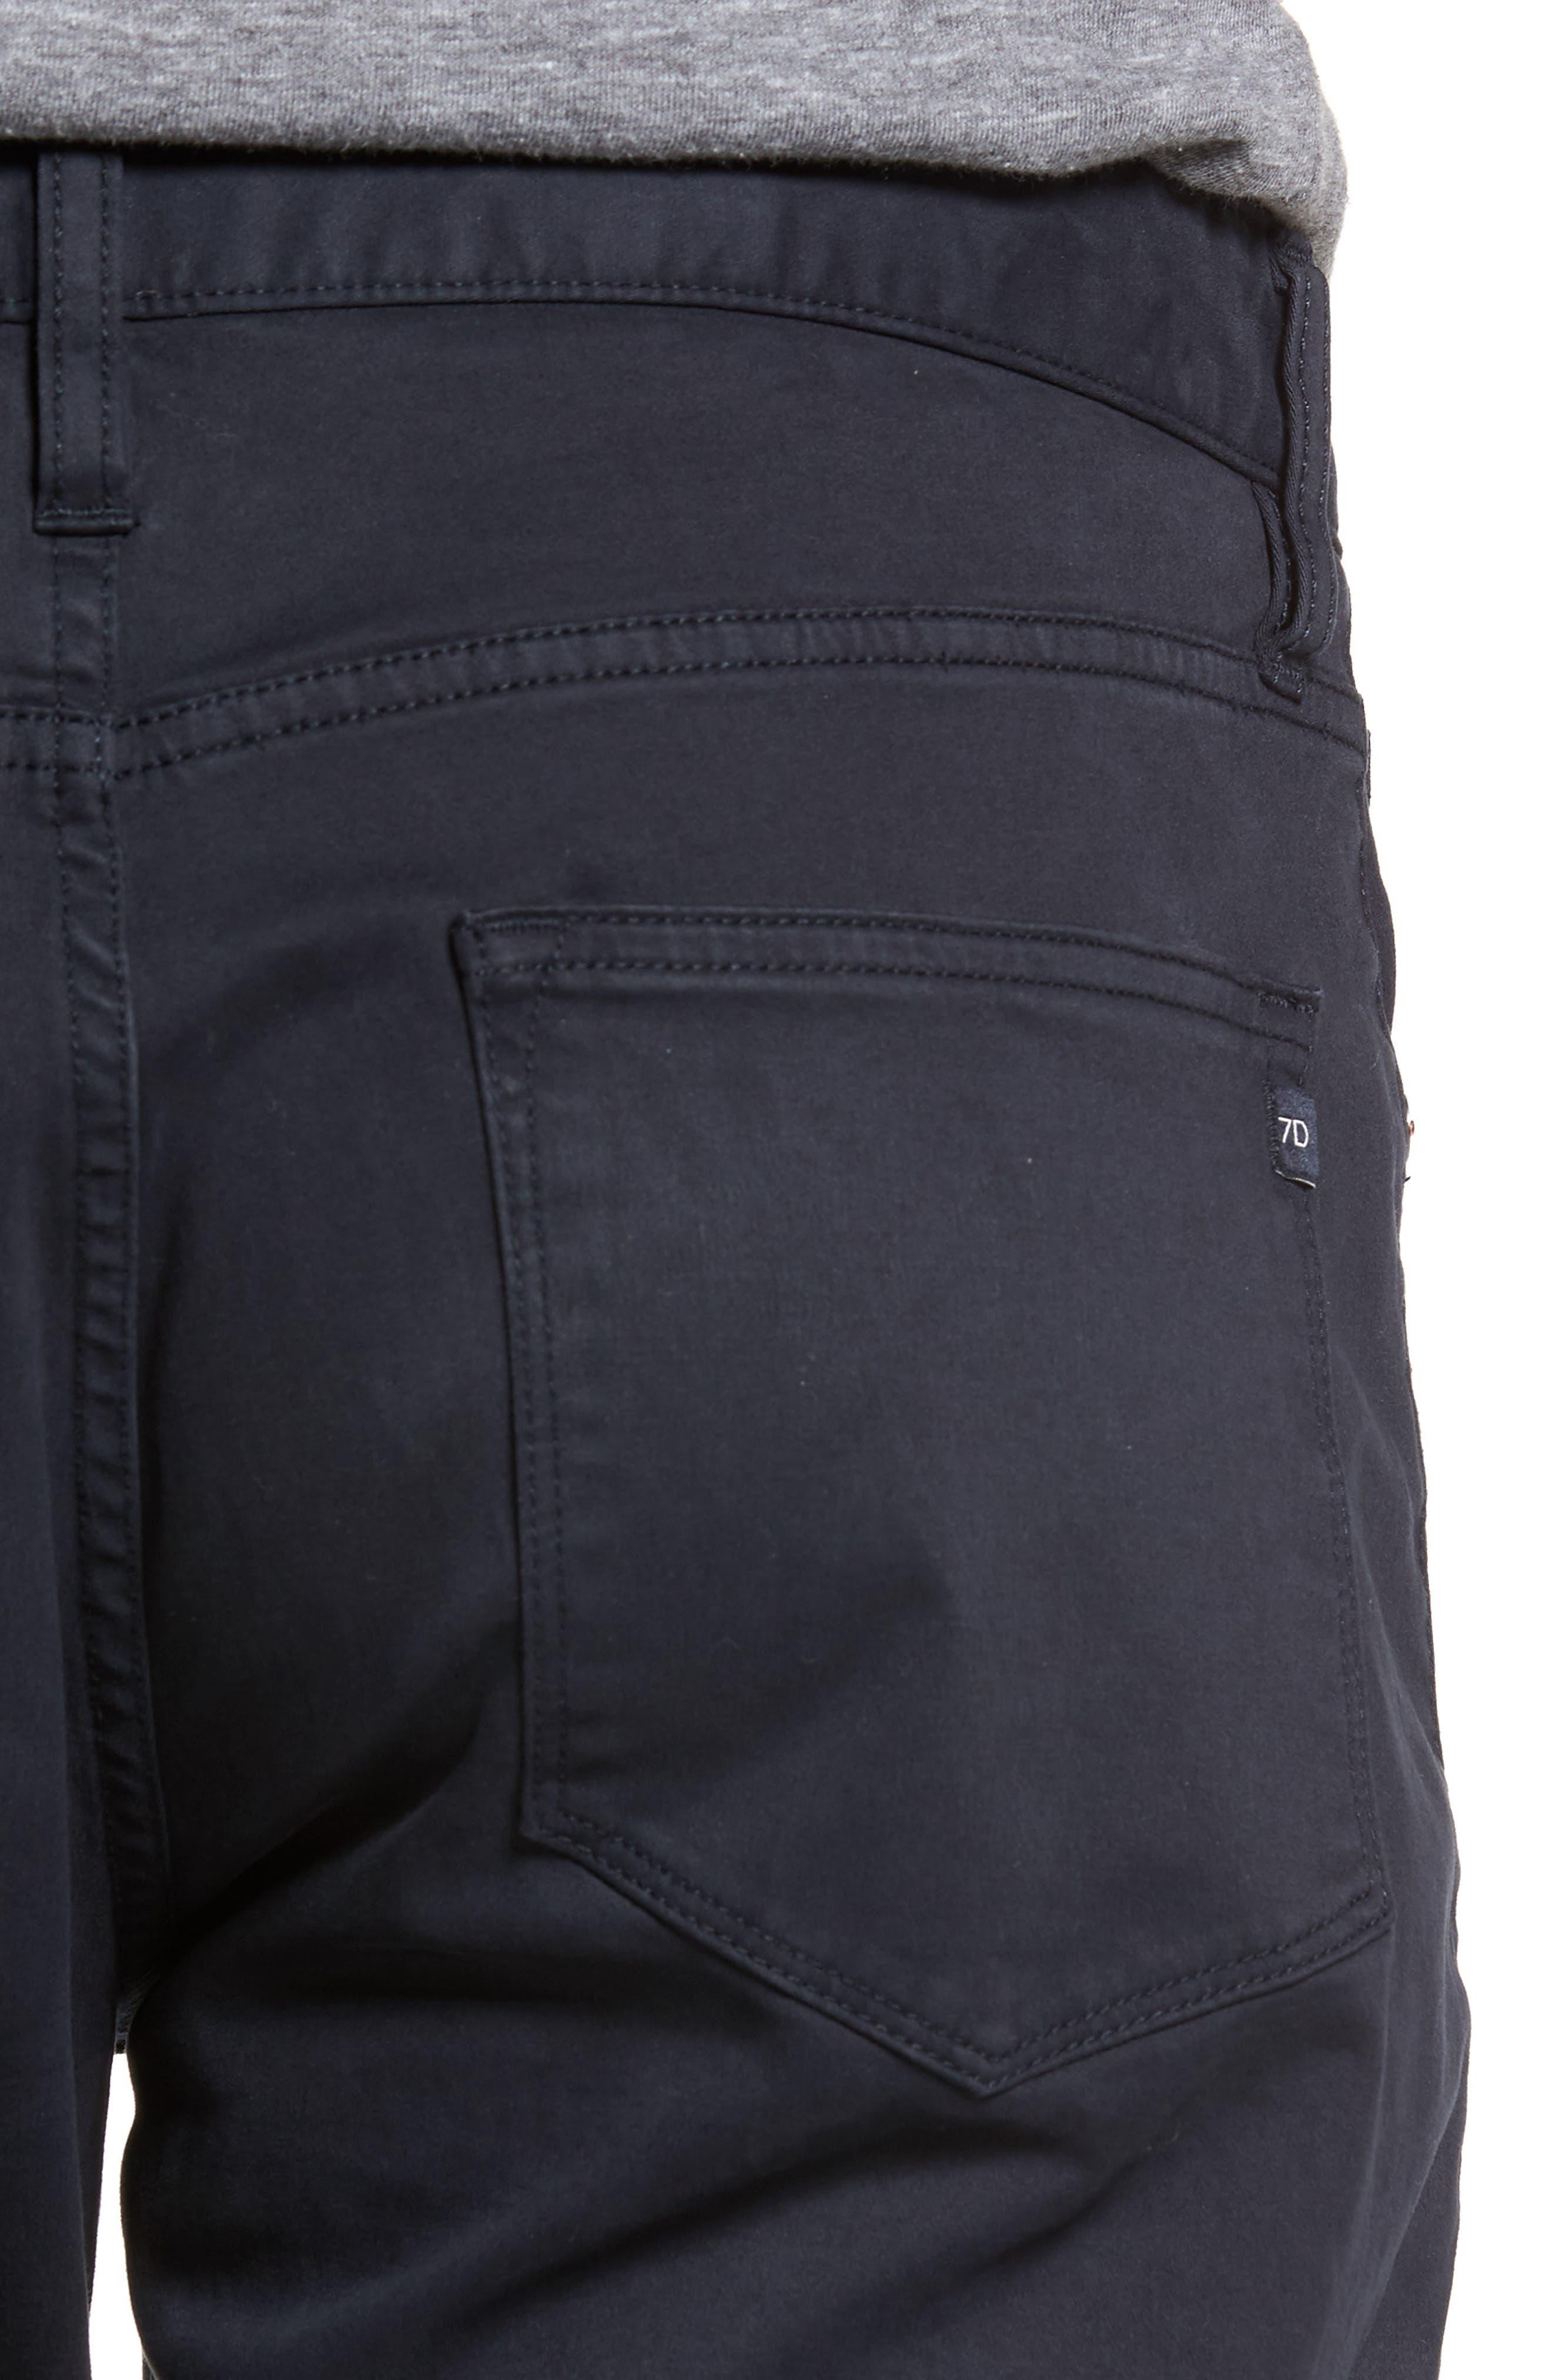 Brushed Twill Five-Pocket Pants,                             Alternate thumbnail 4, color,                             Navy